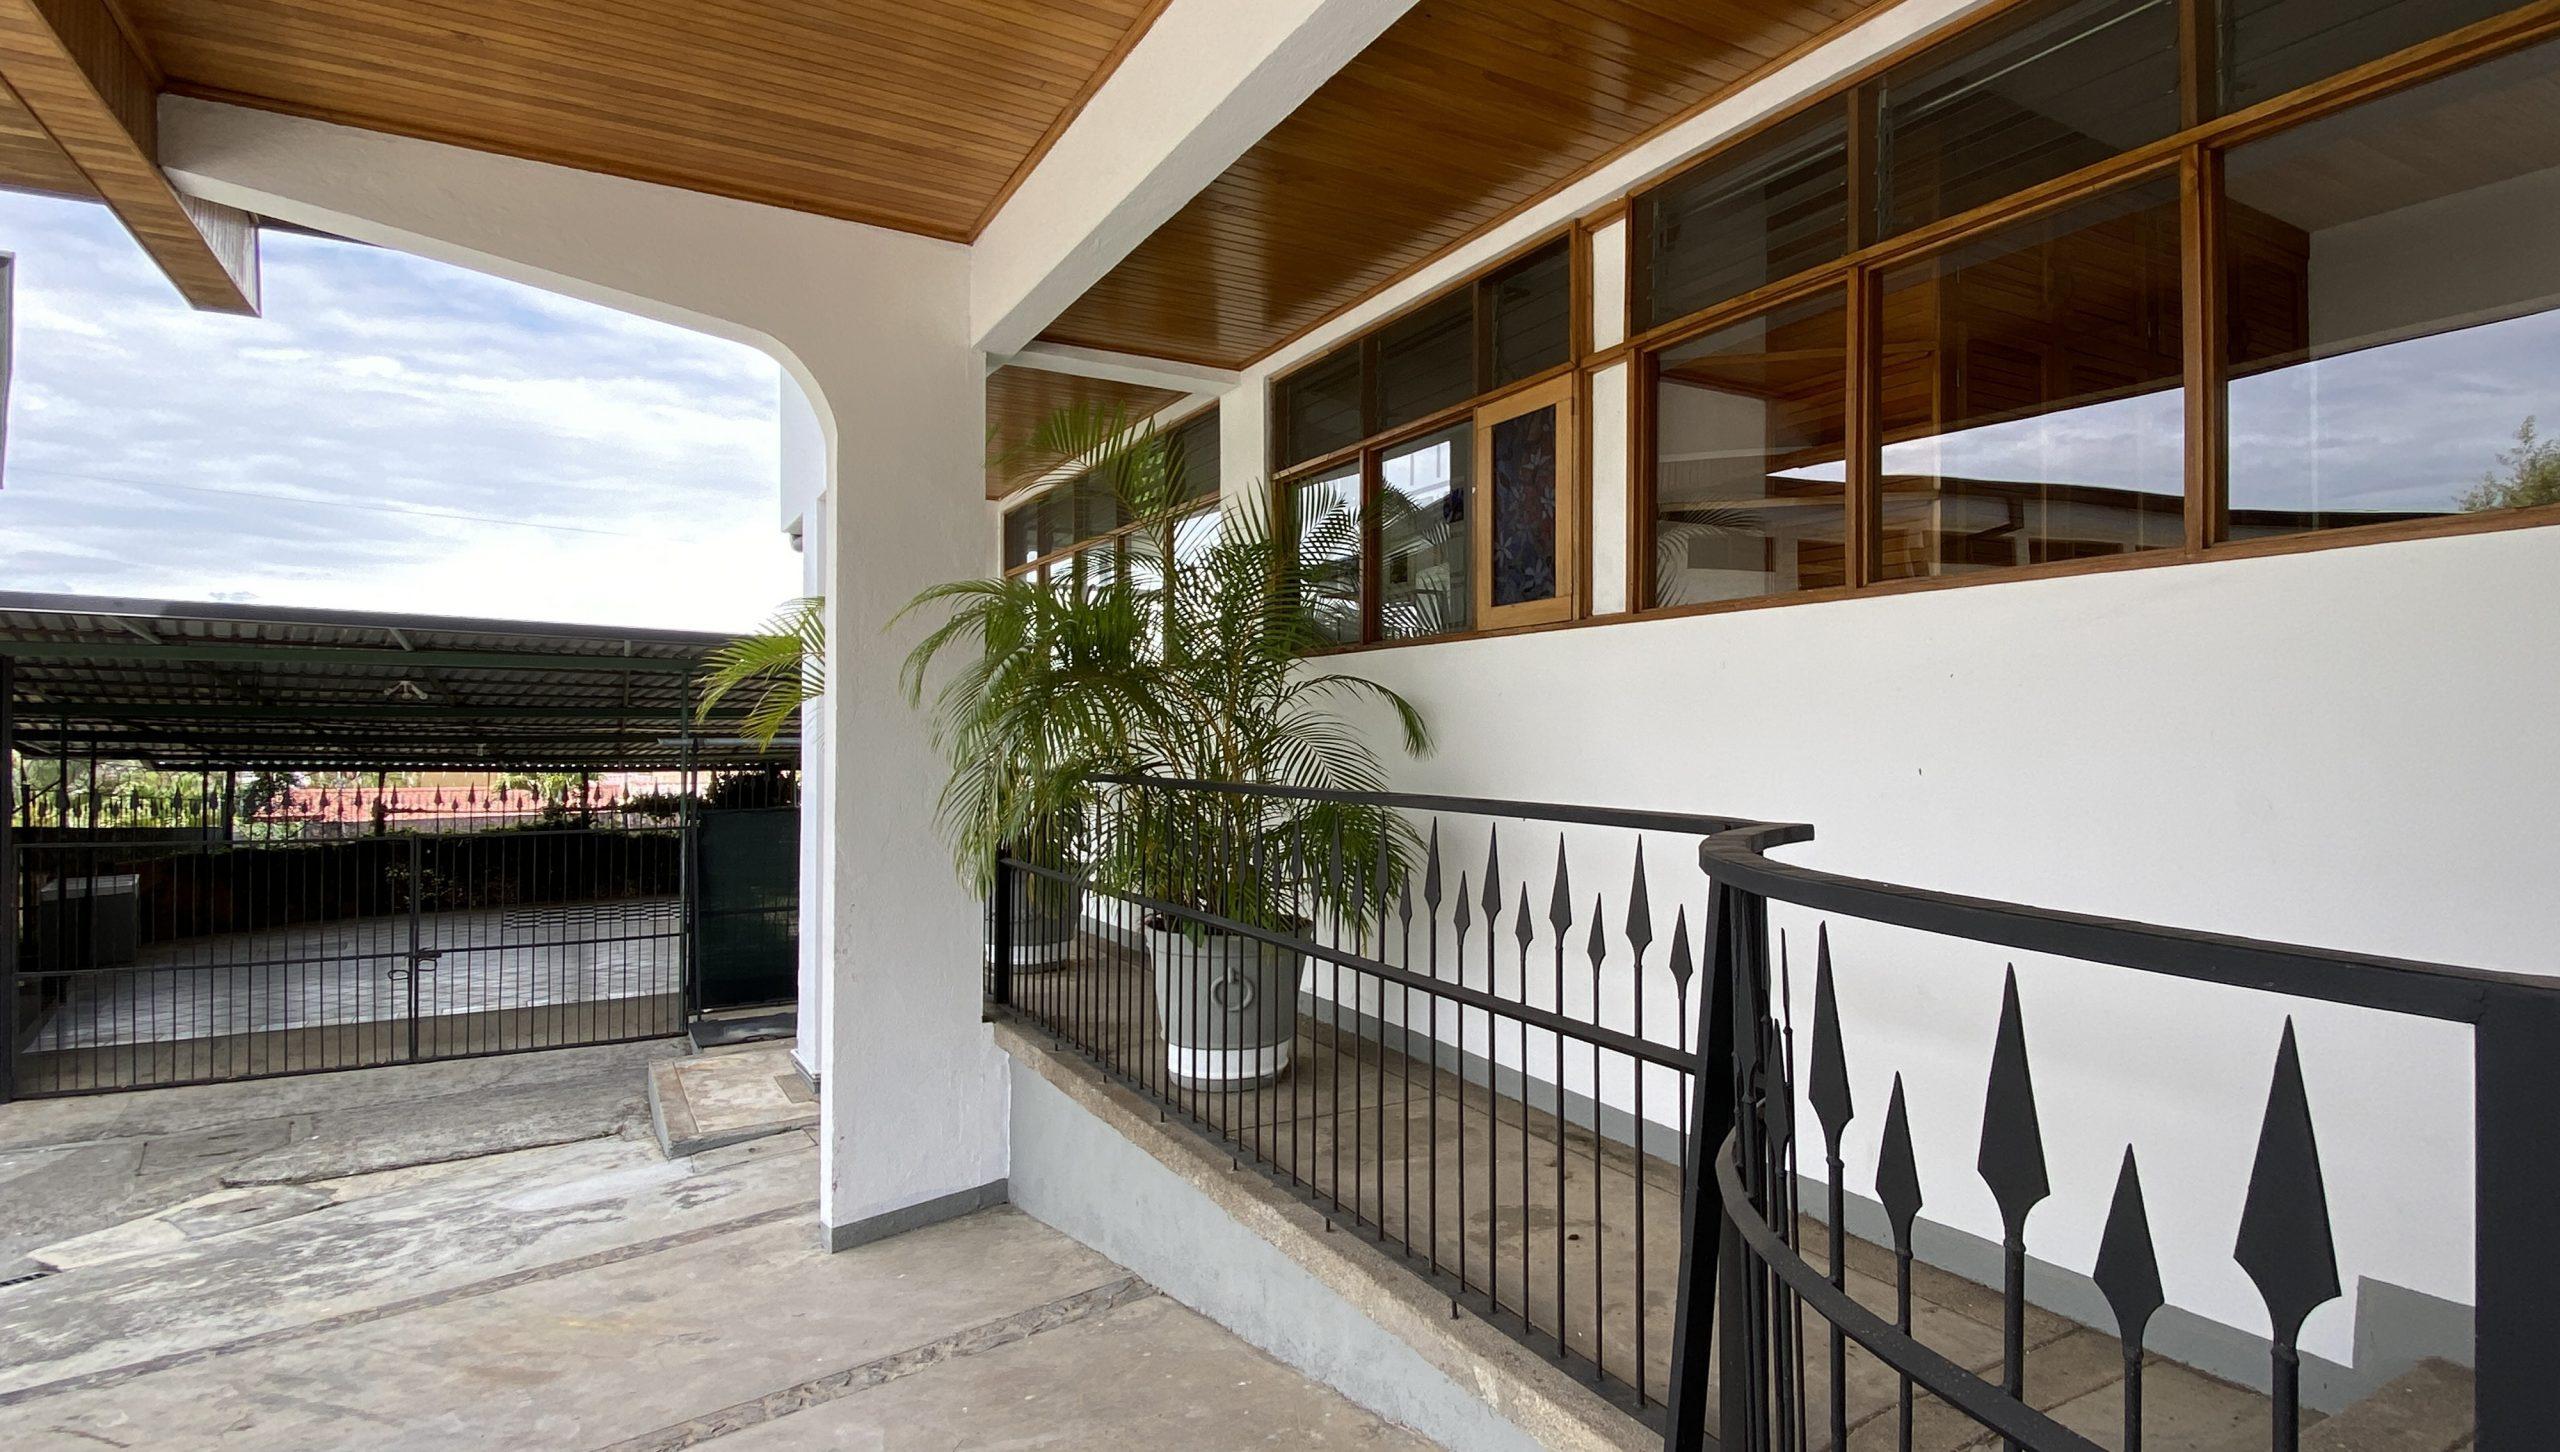 3 Bedroom Apartment For Sale Escazu